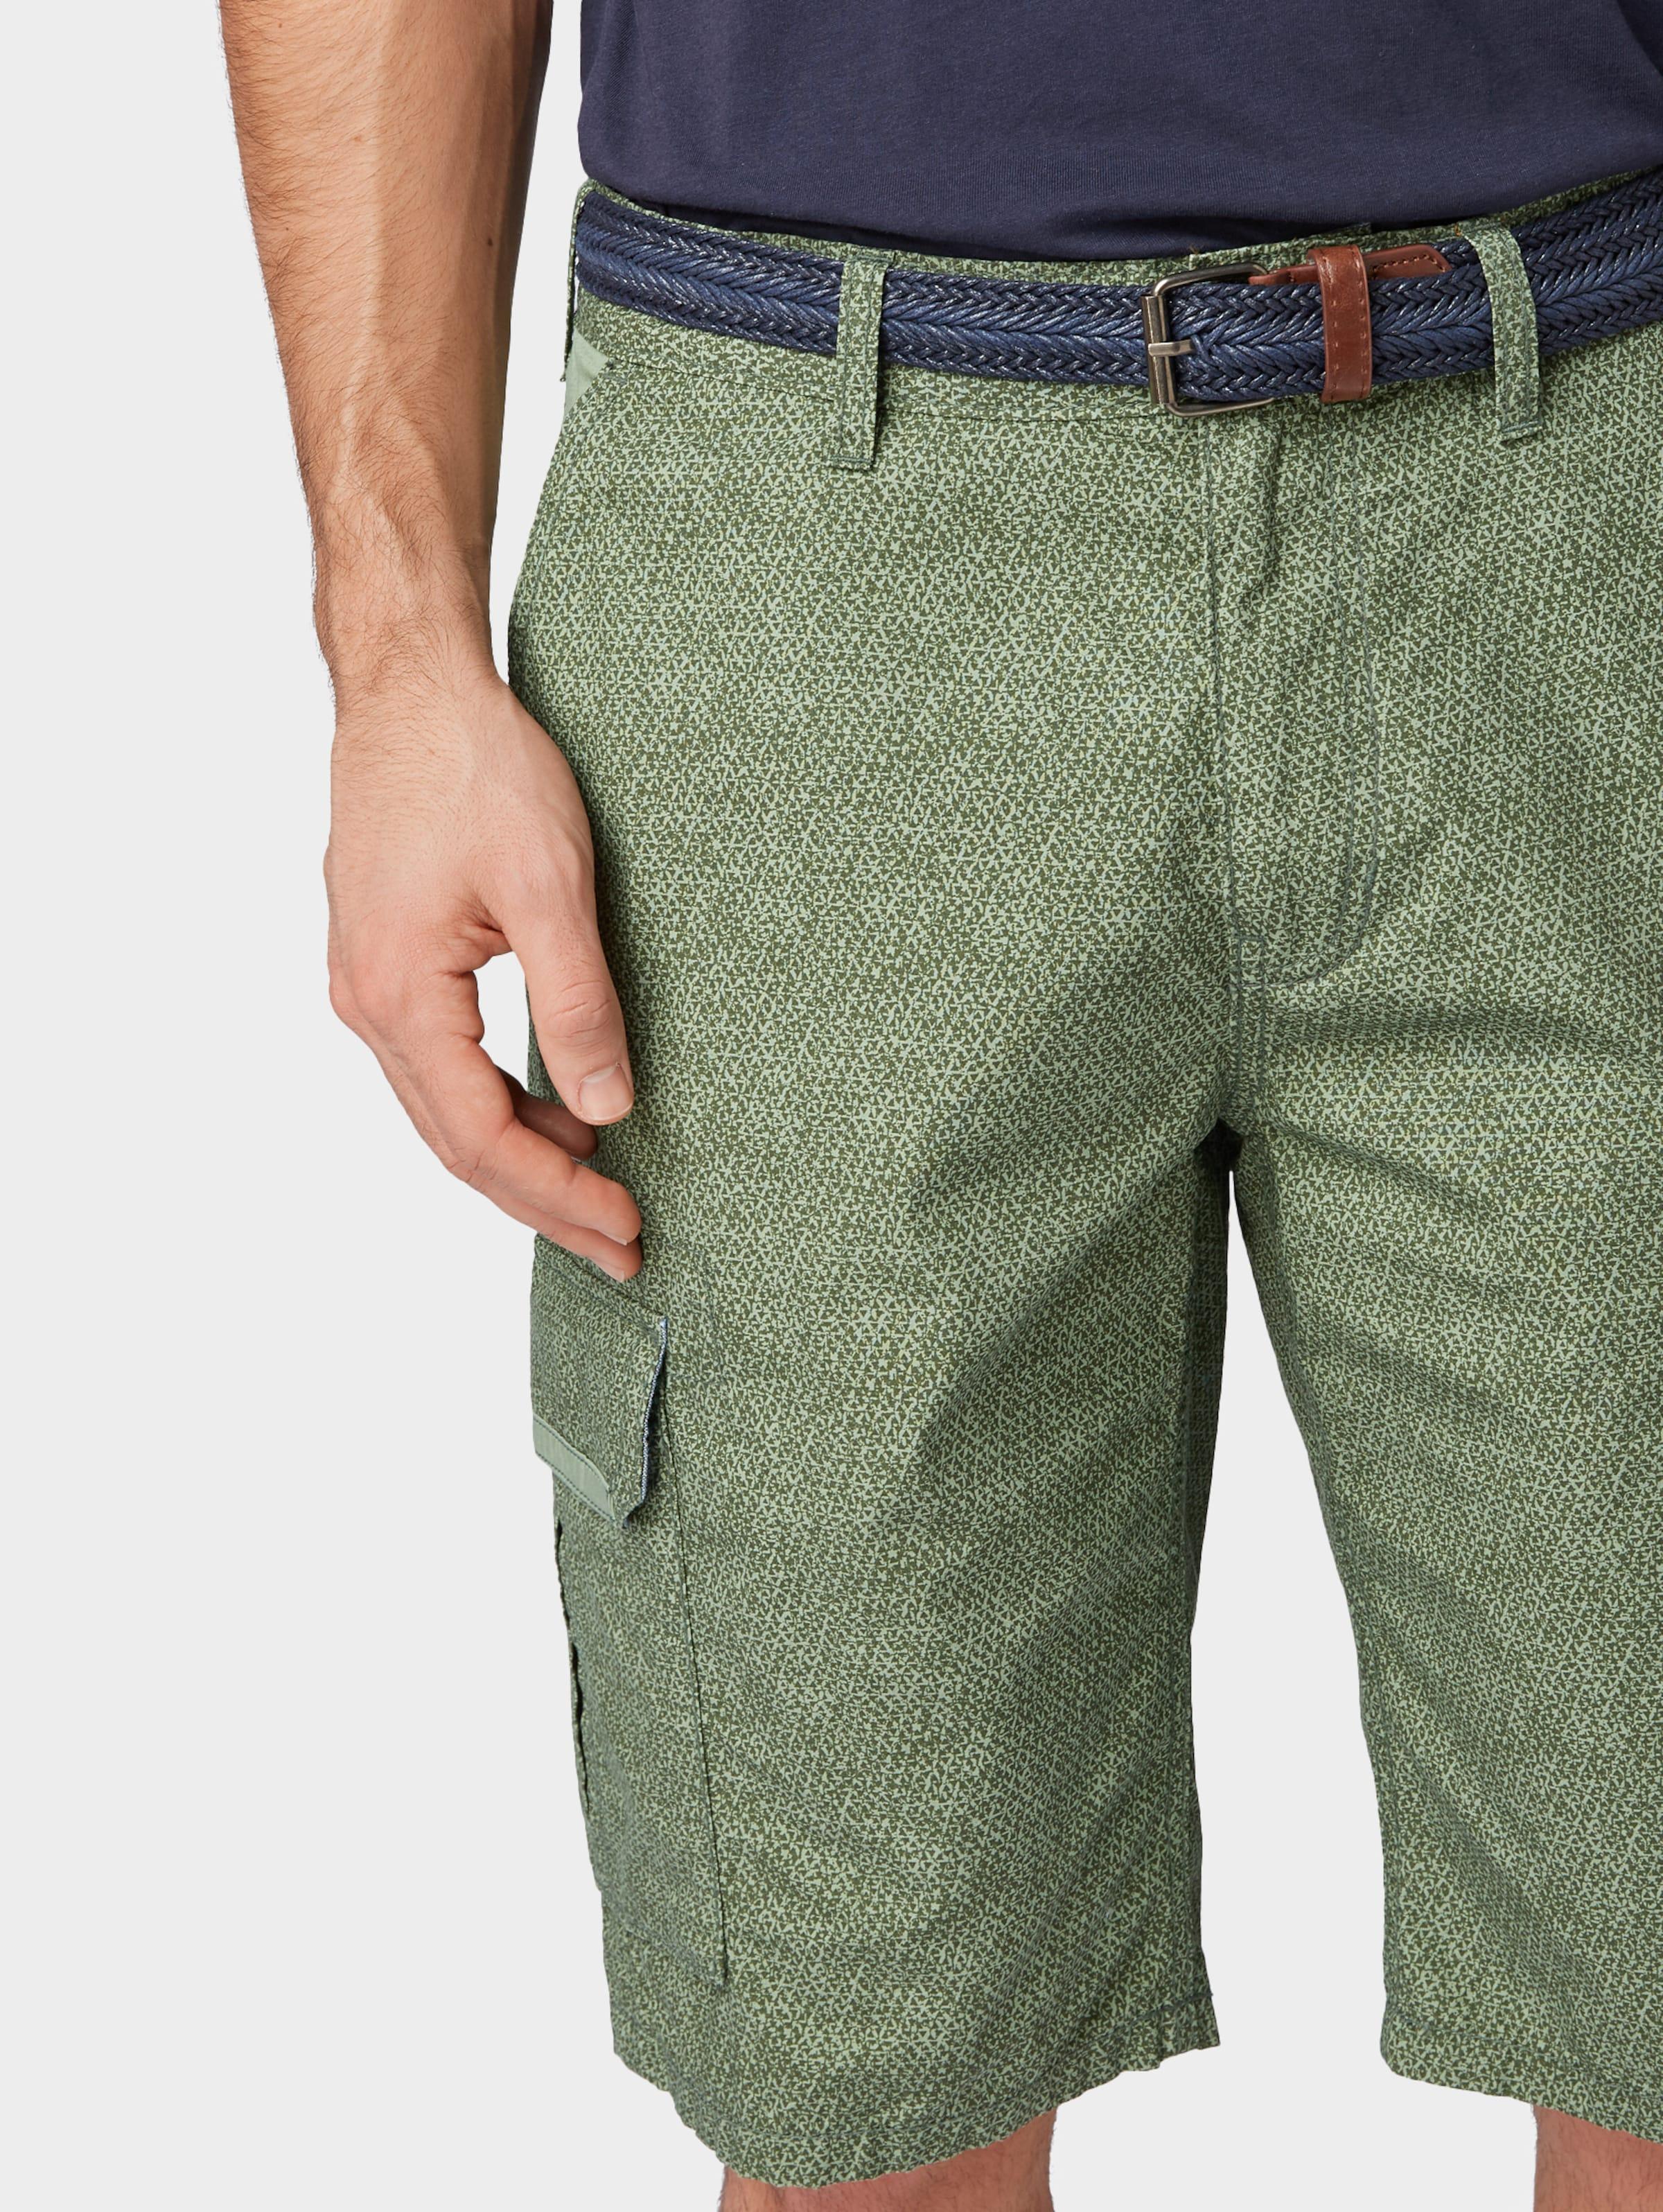 Tailor Shorts Bermuda In Grasgrün Tom cTlFK1J